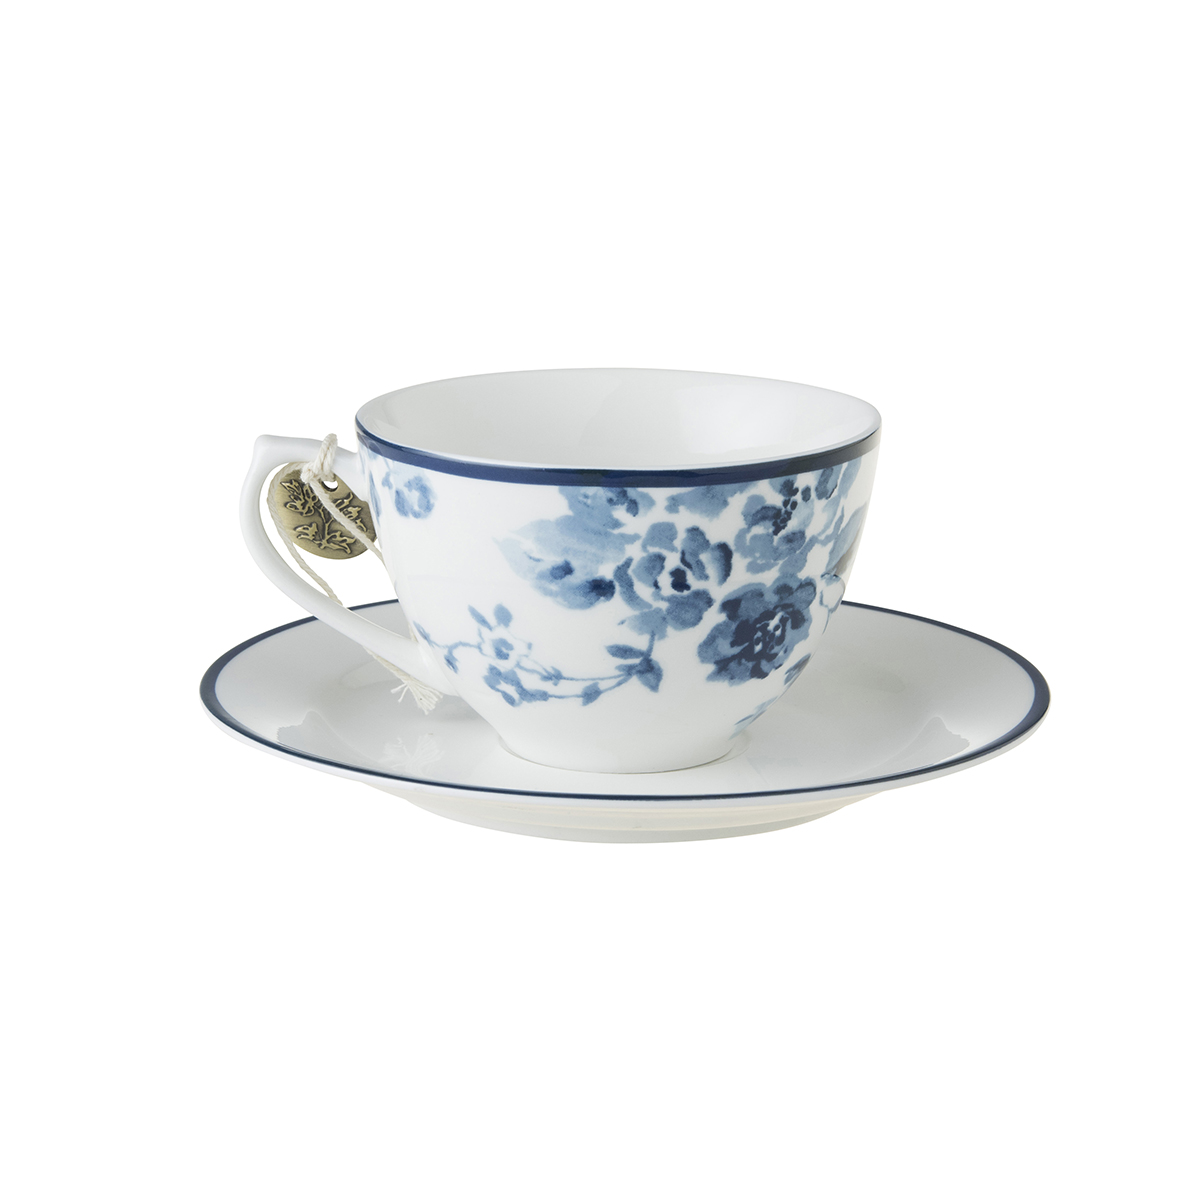 CHINA ROSE CAPPUCCINO CUP & SAUCER